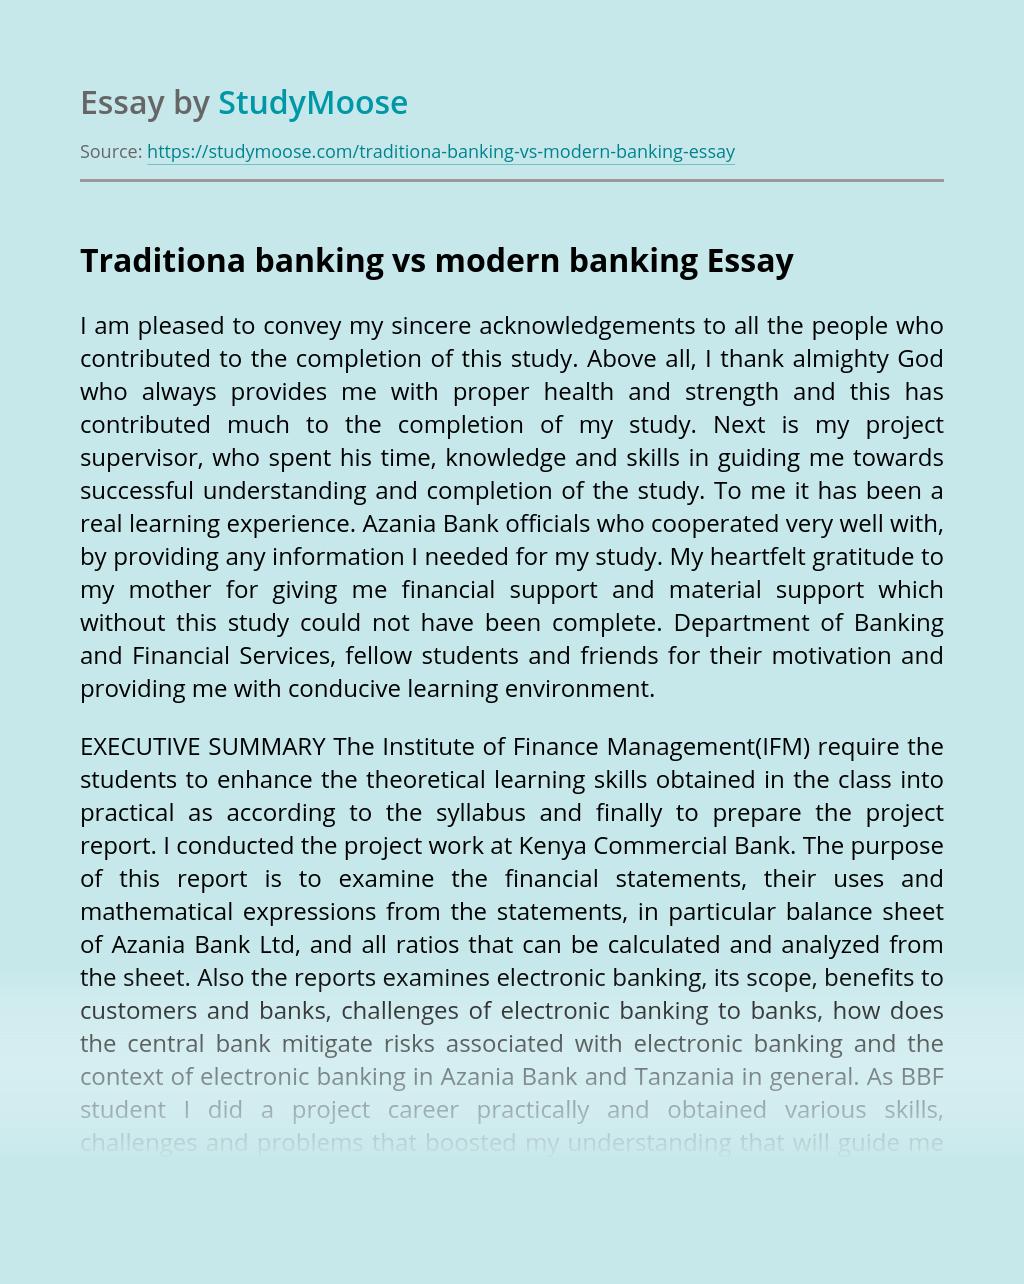 Traditiona banking vs modern banking